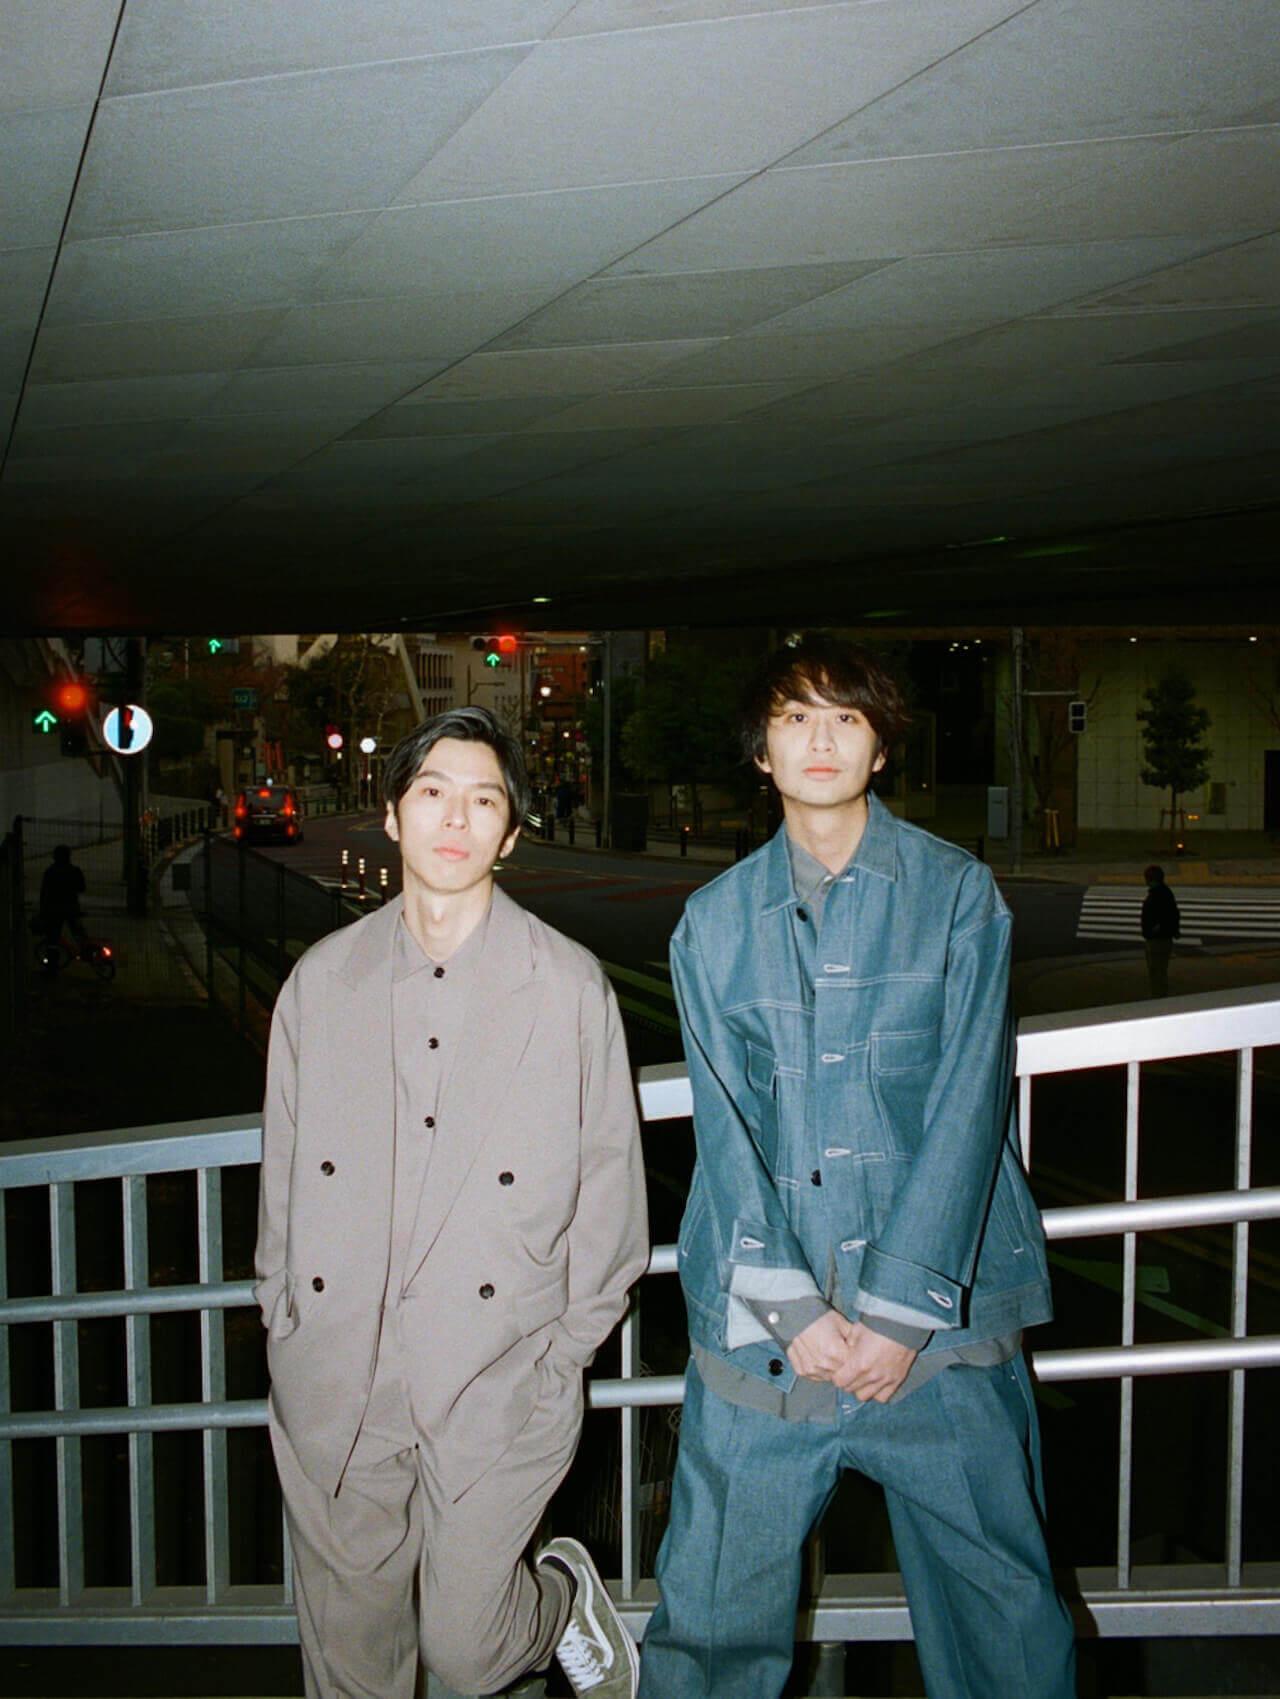 sunsite『Buenos!』──山本幹宗&永嶋柊吾による新バンドの「愛あるオマージュ」とまっすぐな姿勢 interview2105-sunsite-1